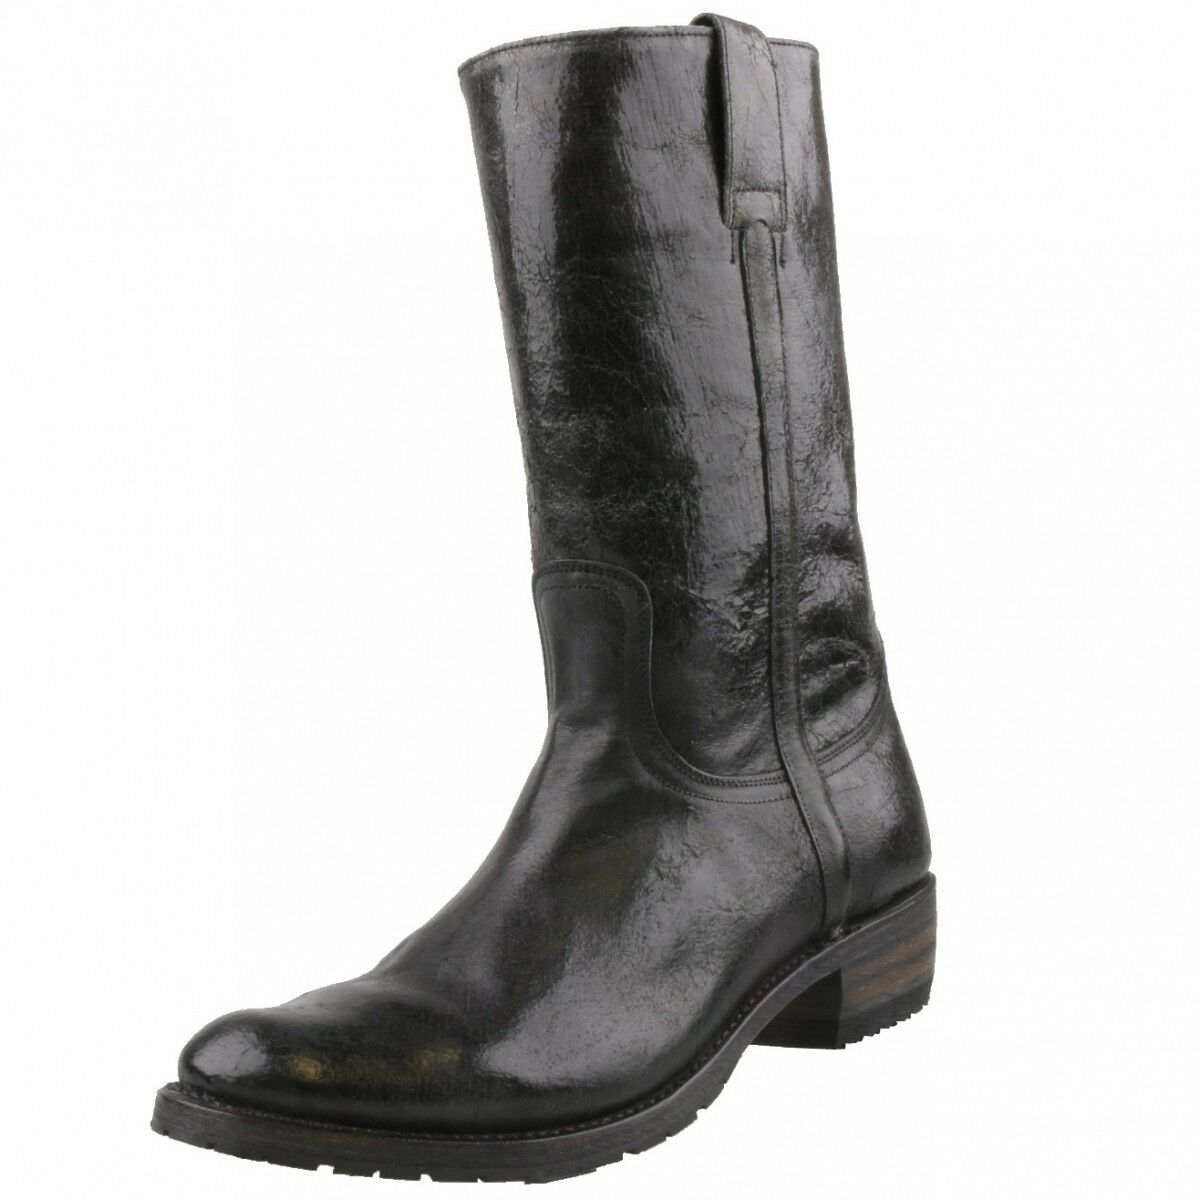 Nuevo cuero Sendra caballeros botas botas motorista-botas 3165 negro